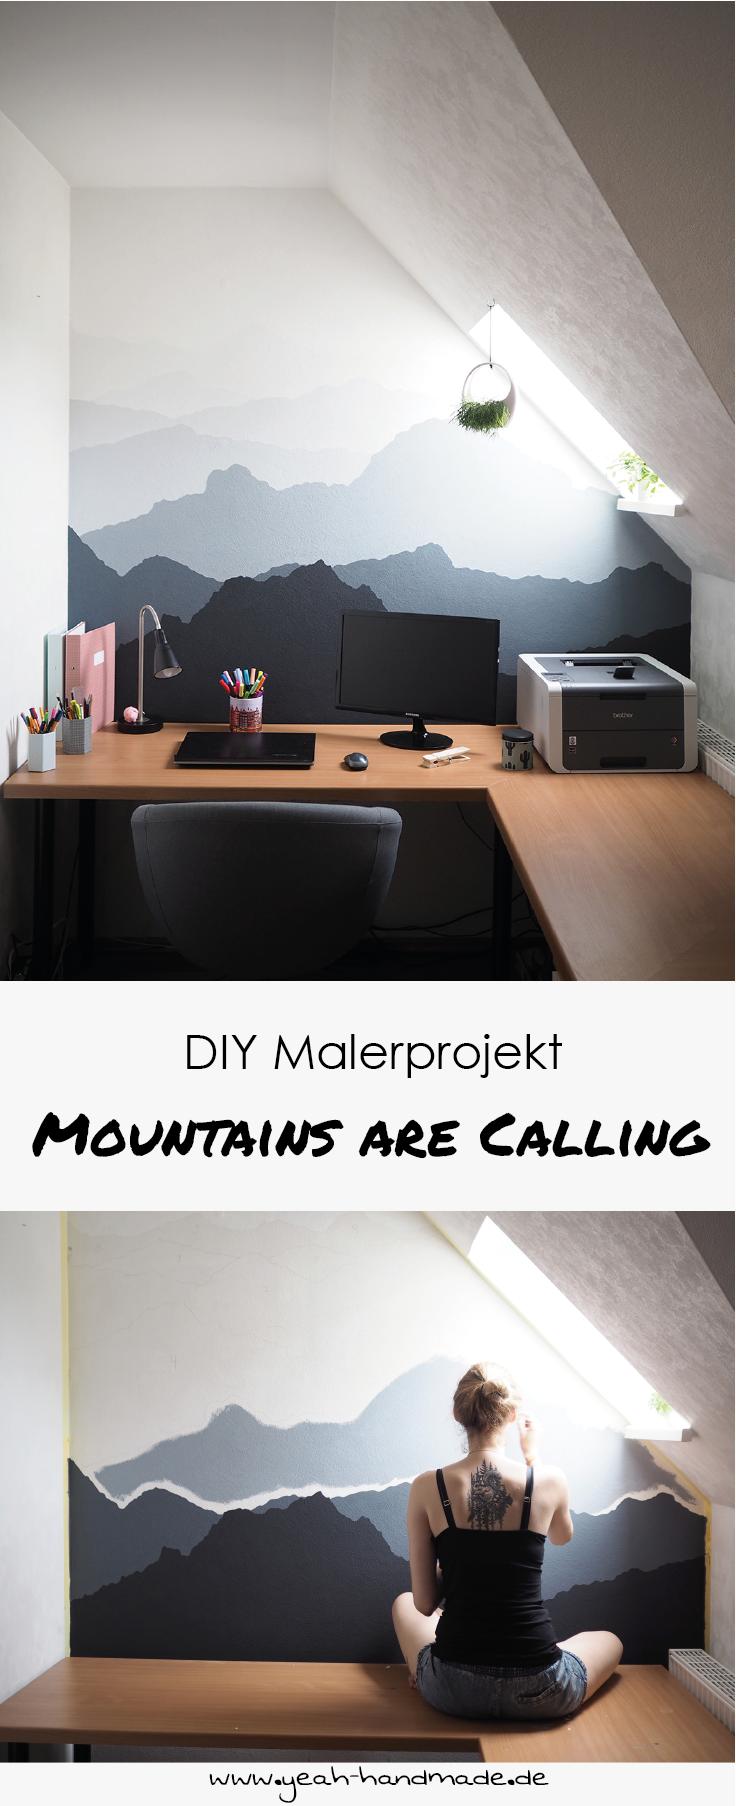 DIY Malerprojekt: Berglandschaft an die Wand malen. Tipps und ...